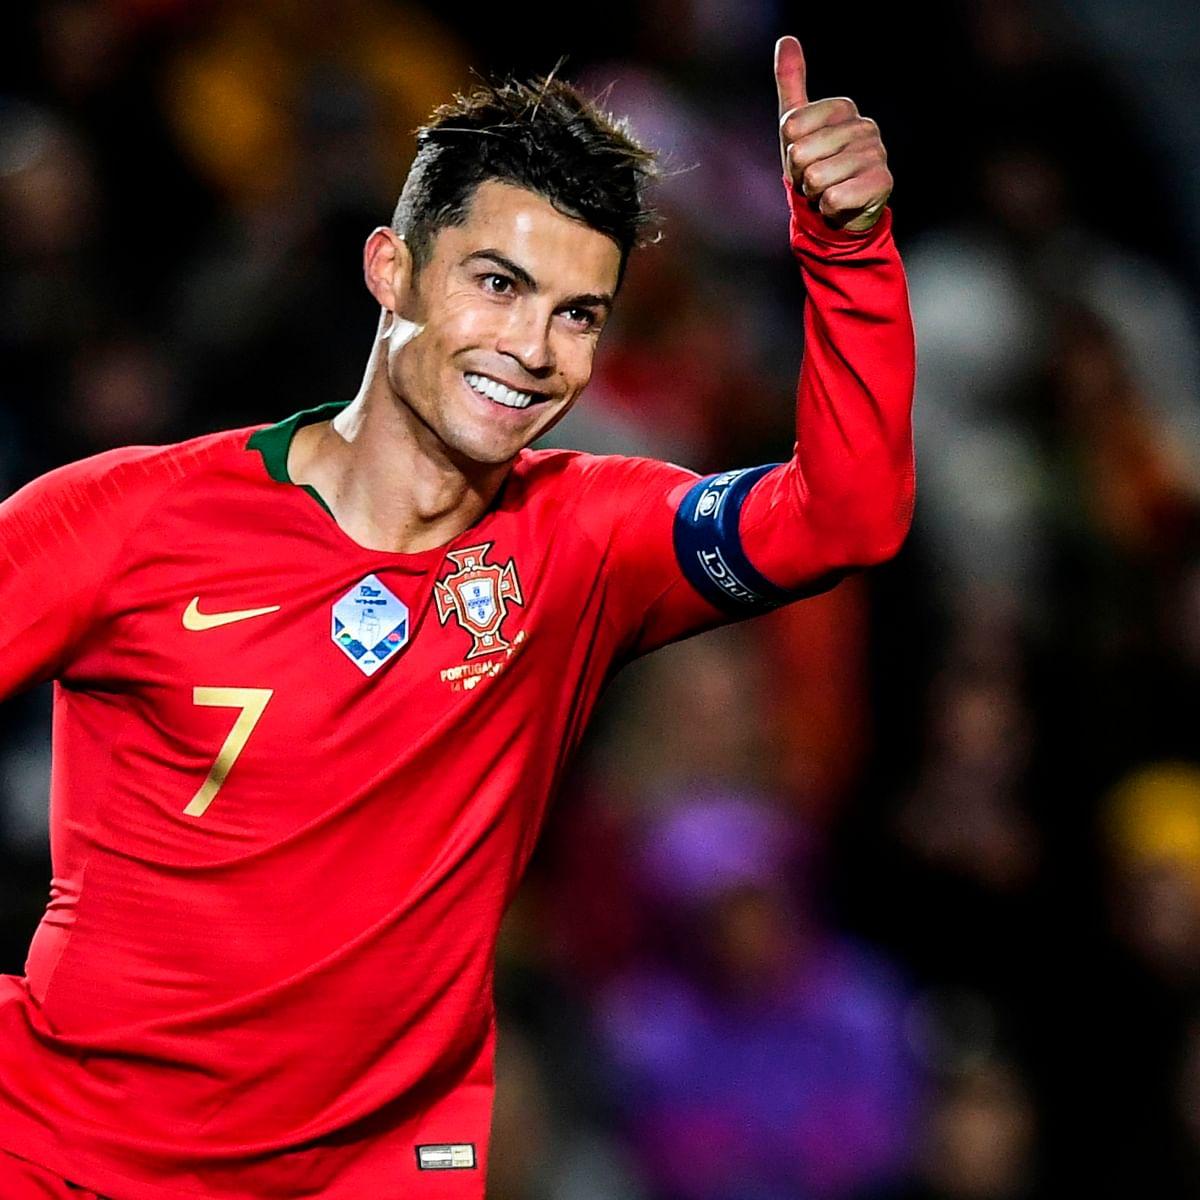 Watch: Cristiano Ronaldo scripts history, becomes first European to surpass 100 international goals